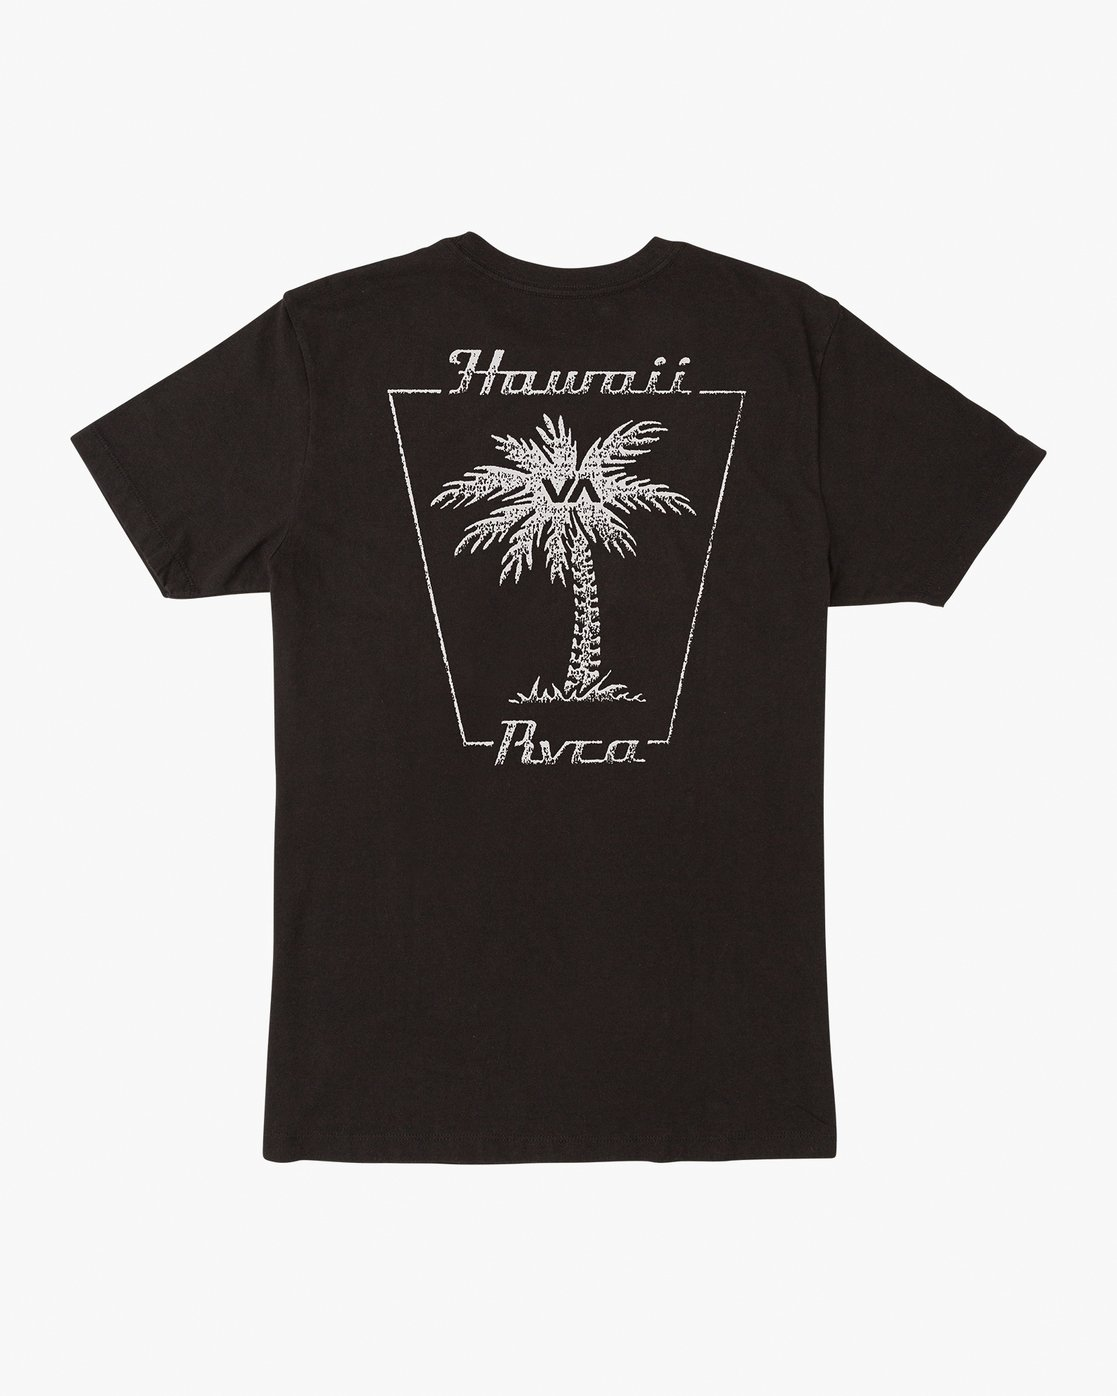 0 Resort HI T-Shirt Black M401VRRE RVCA